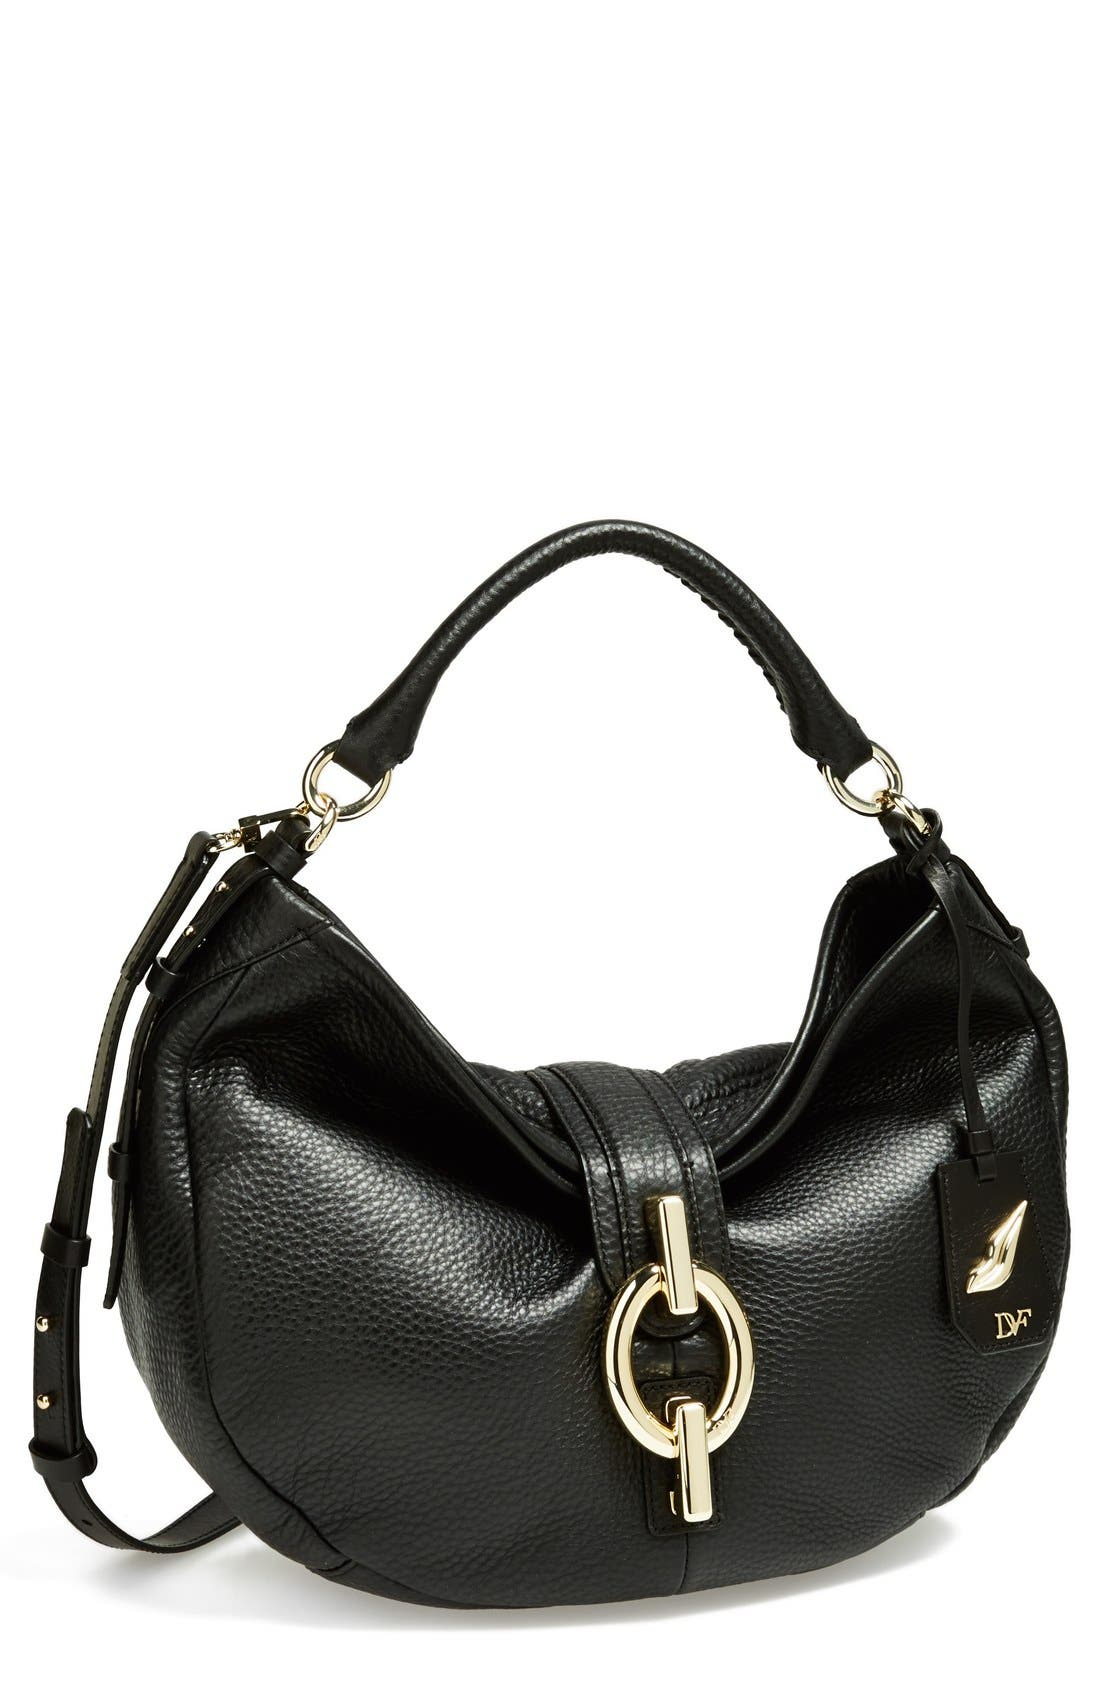 Main Image - Diane von Furstenberg 'Sutra' Grainy Leather Hobo